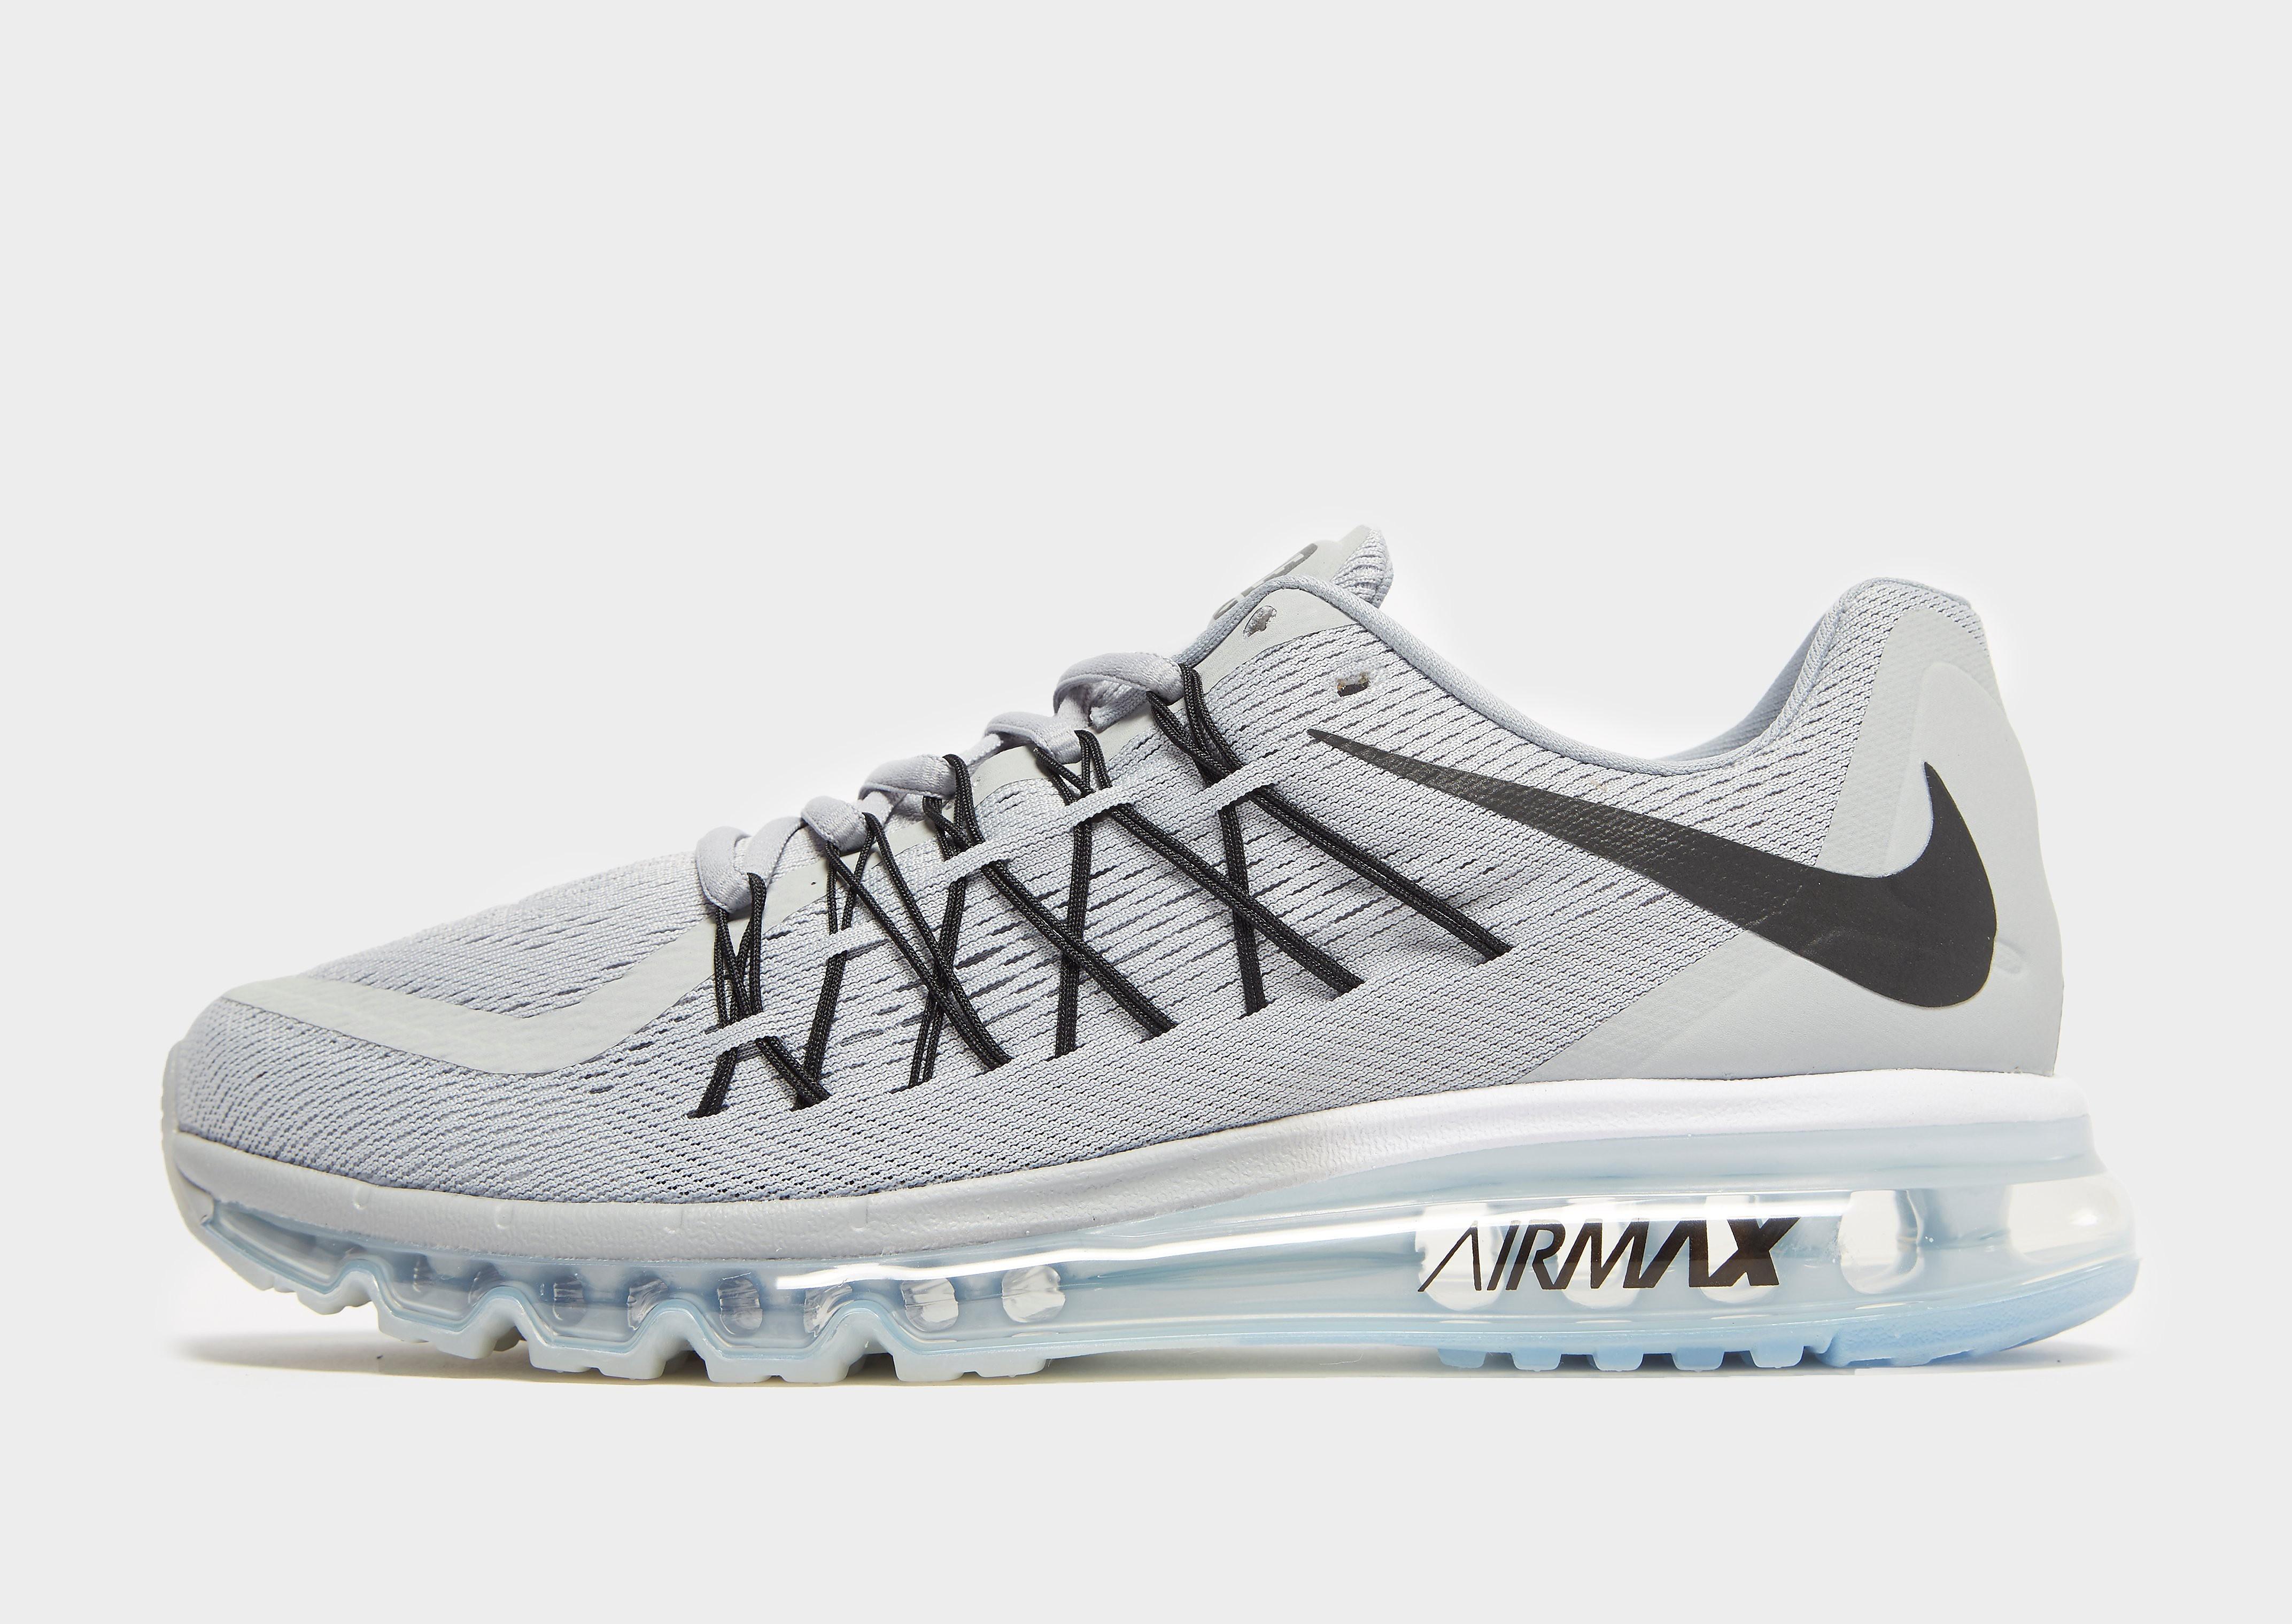 Nike Air Max 2015 herensneaker zwart en grijs